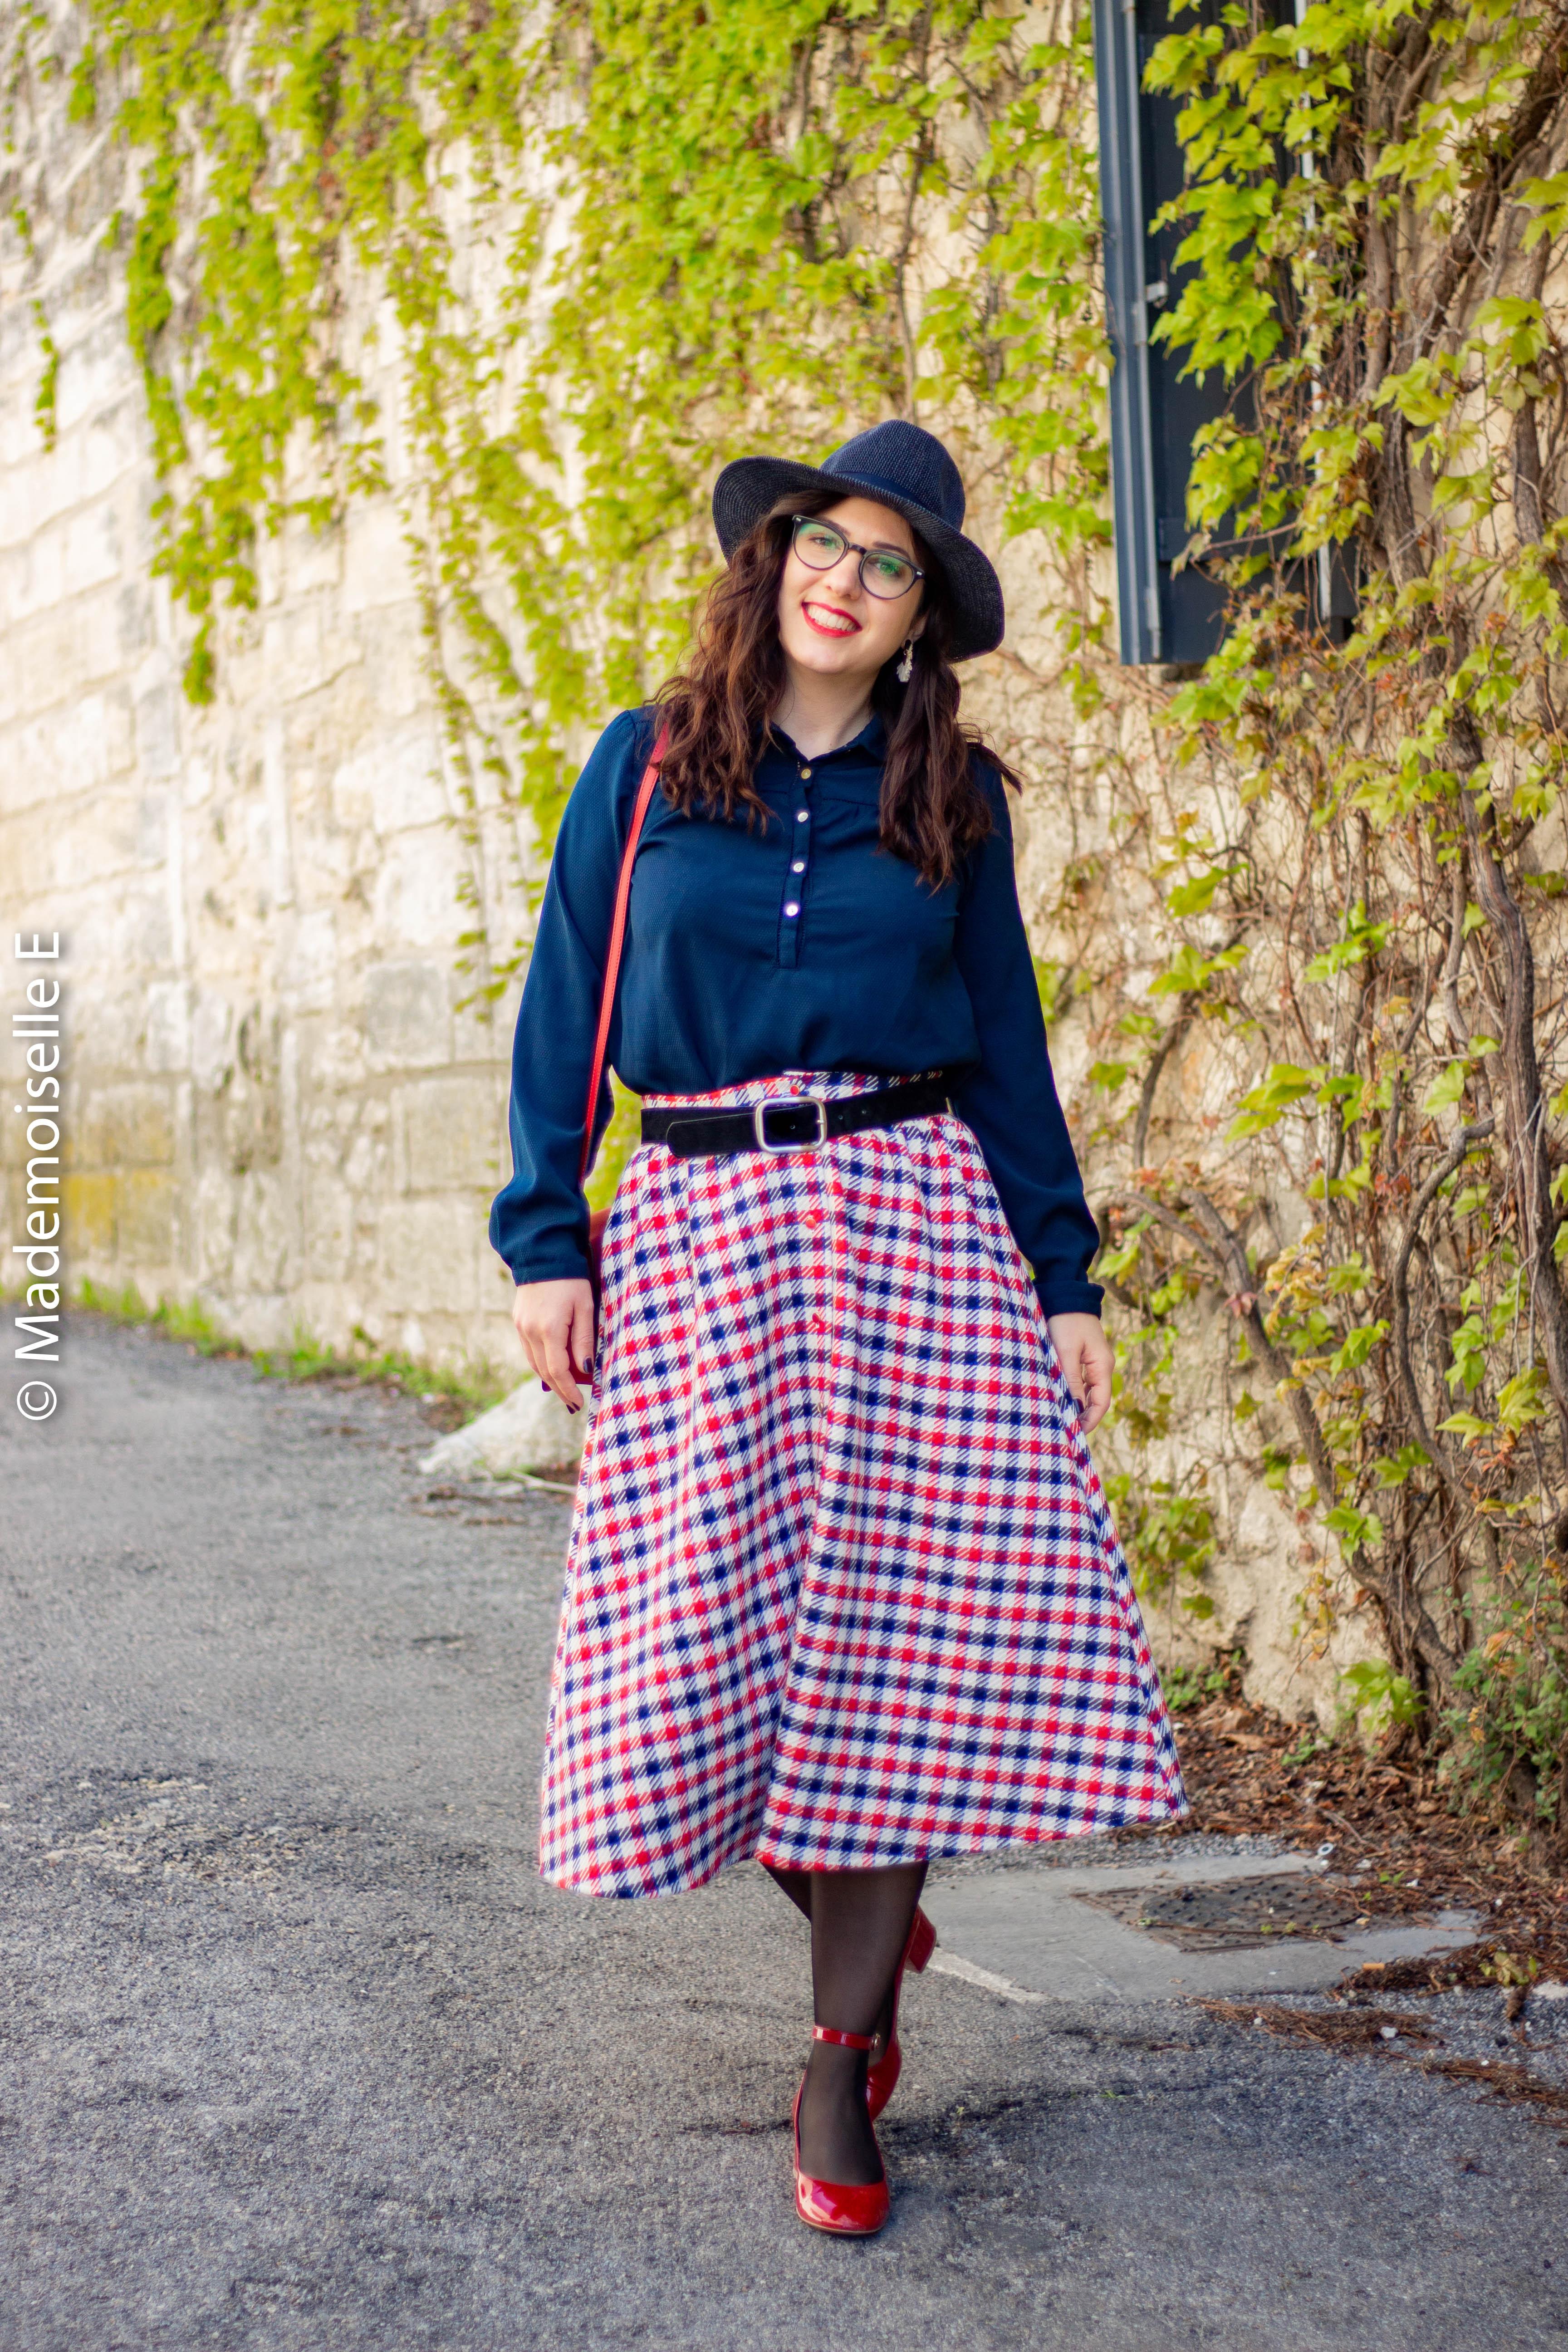 blog-mode-femme-jupe-midi-boutonnée-16-mademoiselle-e